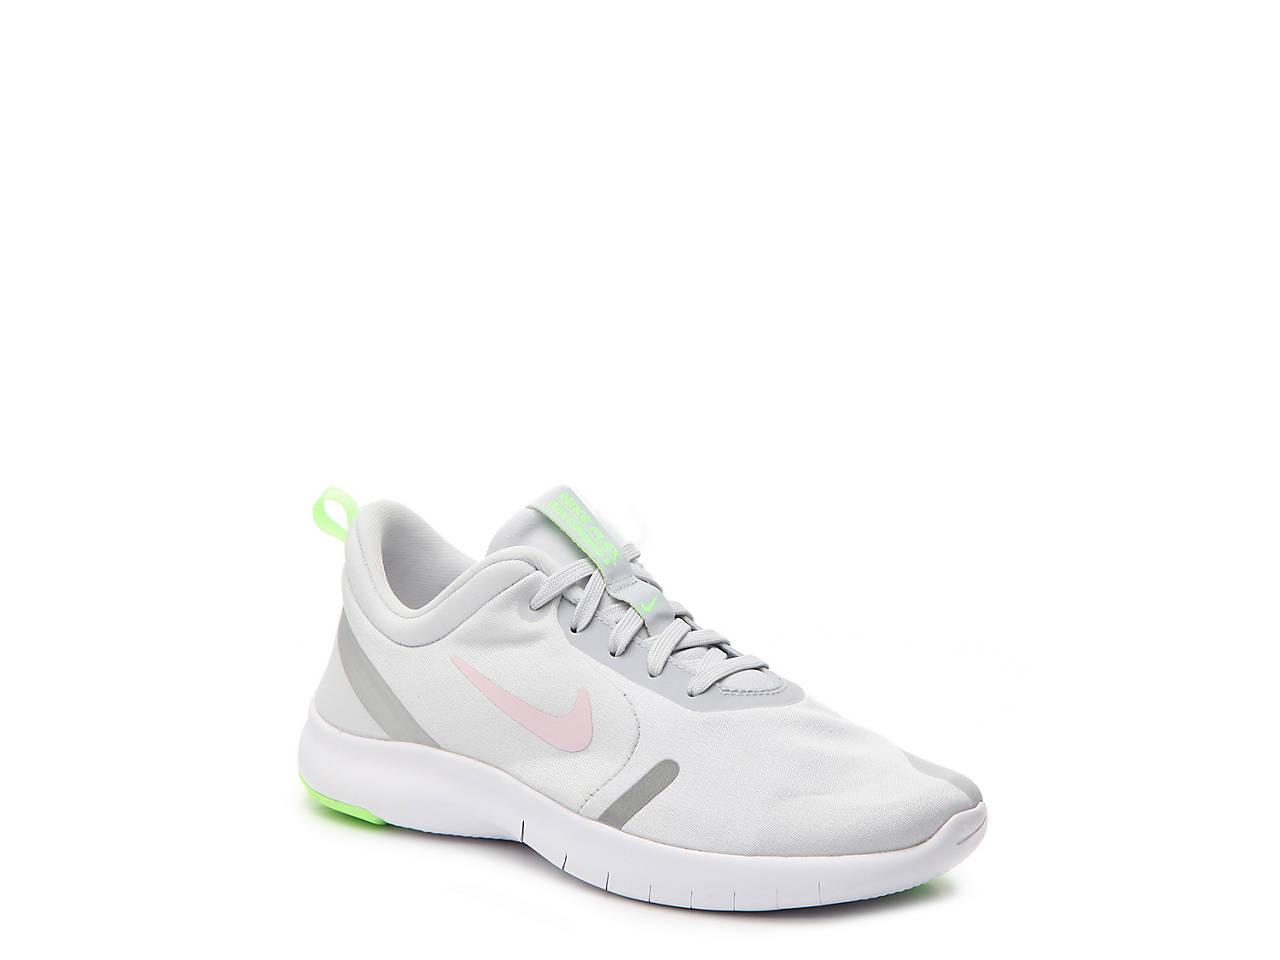 ff195e48c9f8c Nike Flex Experience RN 8 Youth Running Shoe Kids Shoes